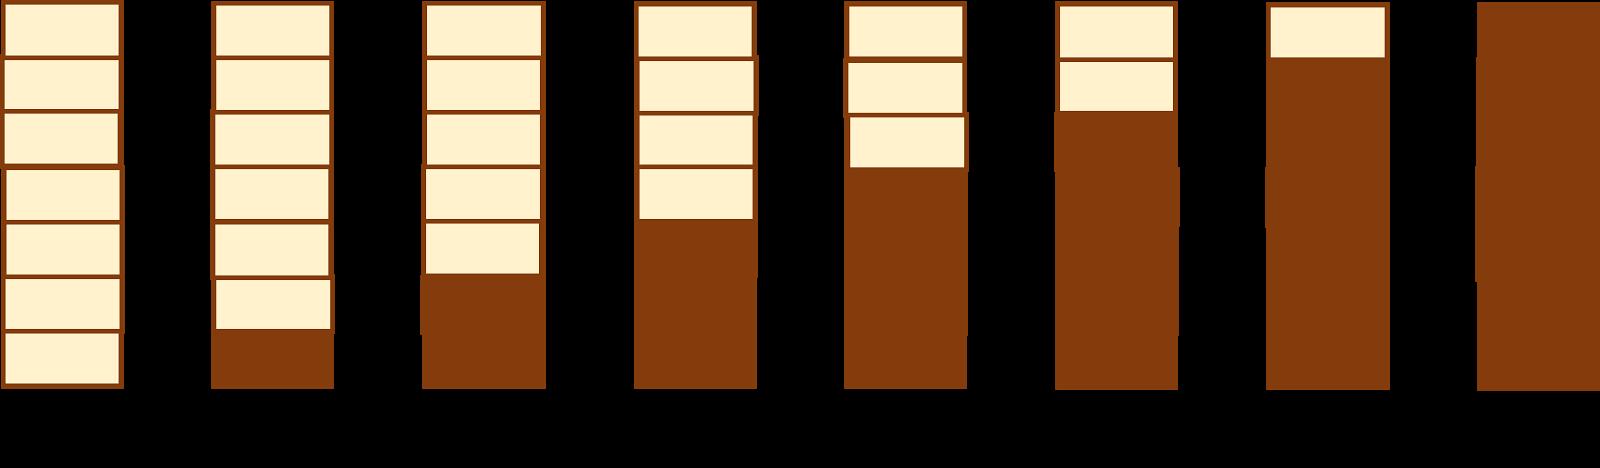 Binary to thermometer code converter : VLSI n EDA